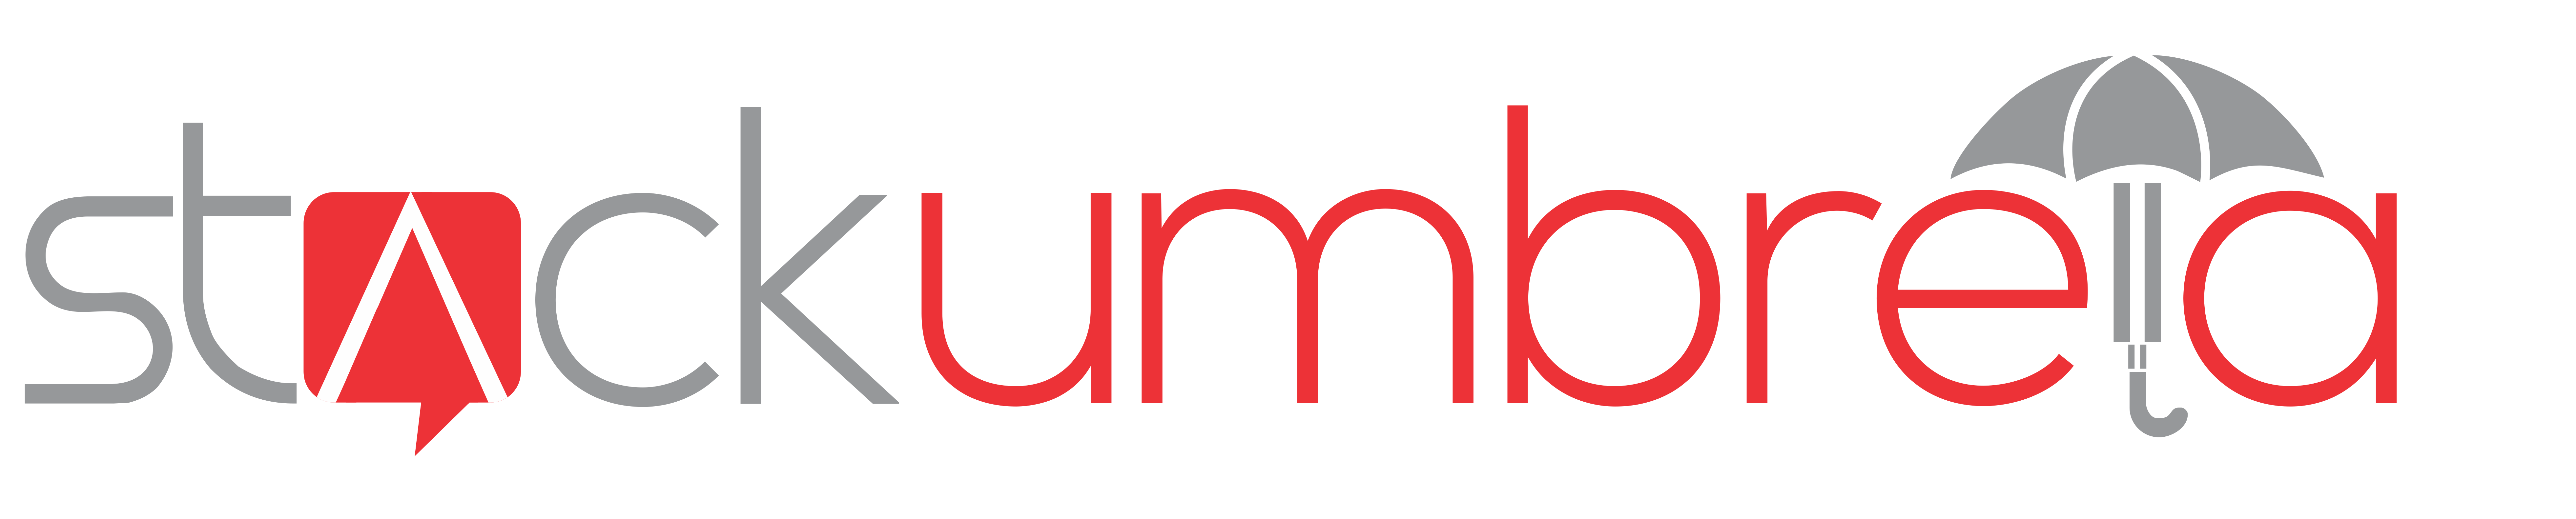 stackumbrella